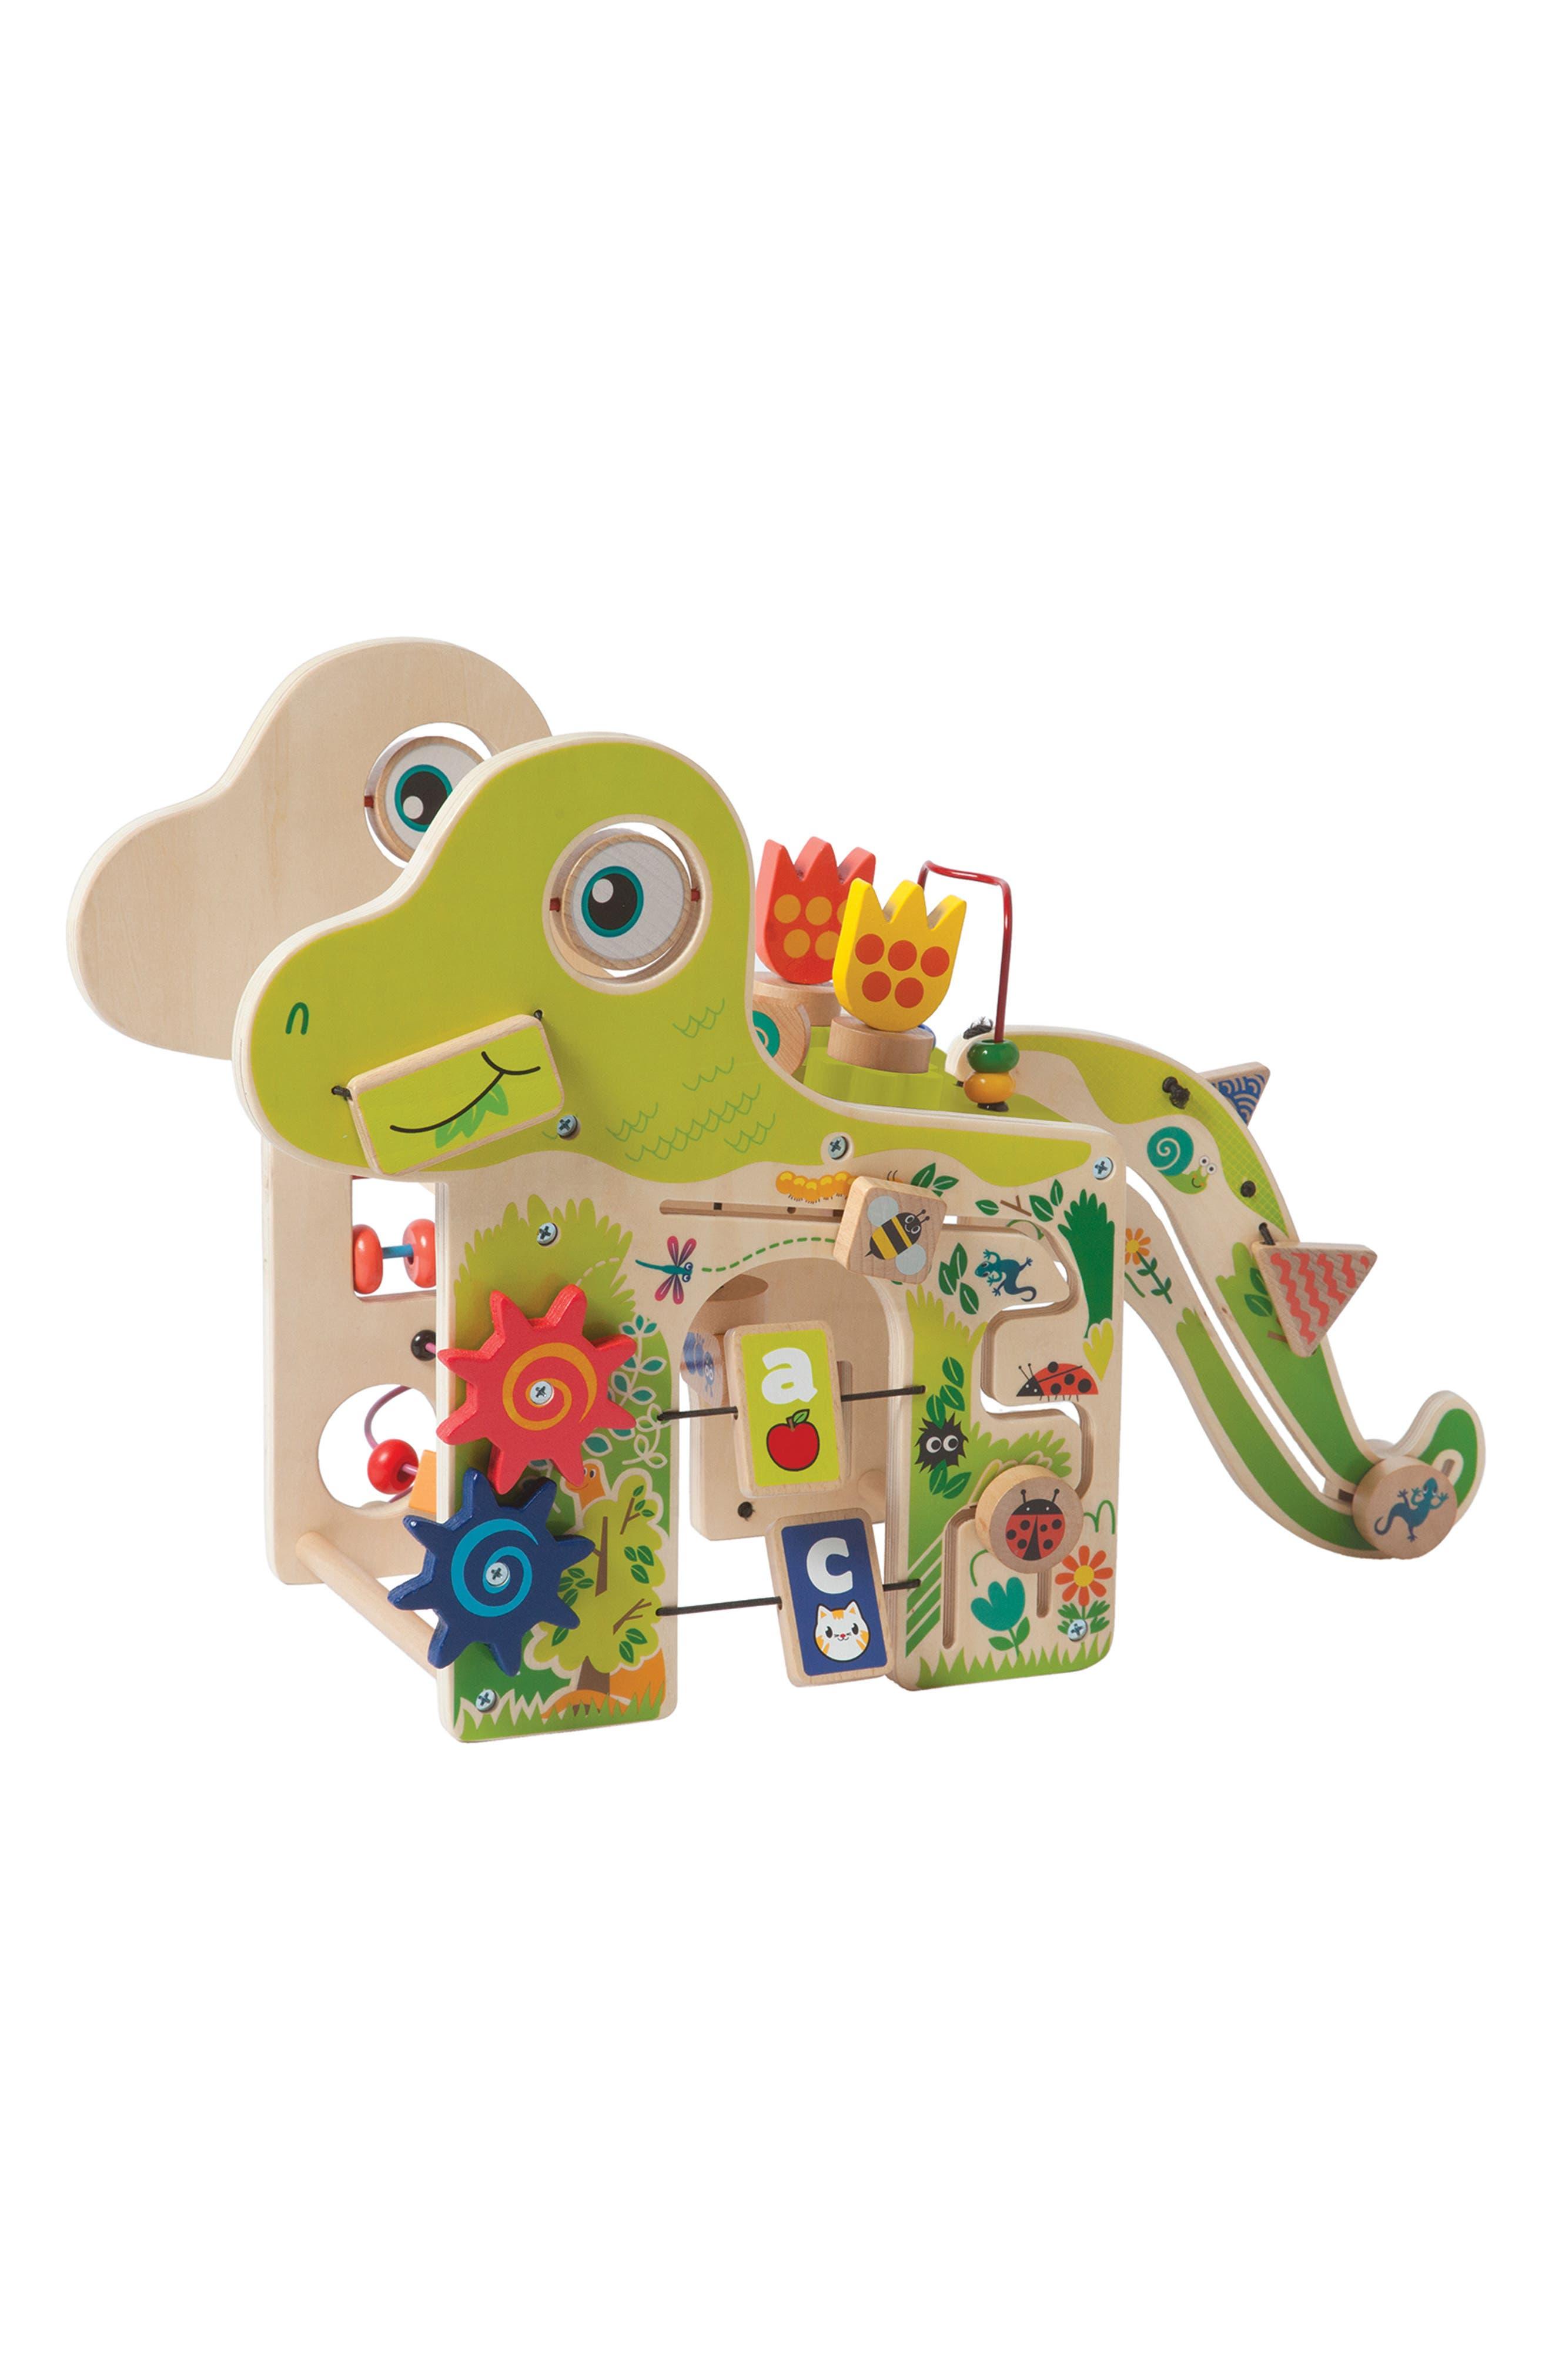 Wooden Playful Dino Activity Center,                             Main thumbnail 1, color,                             300